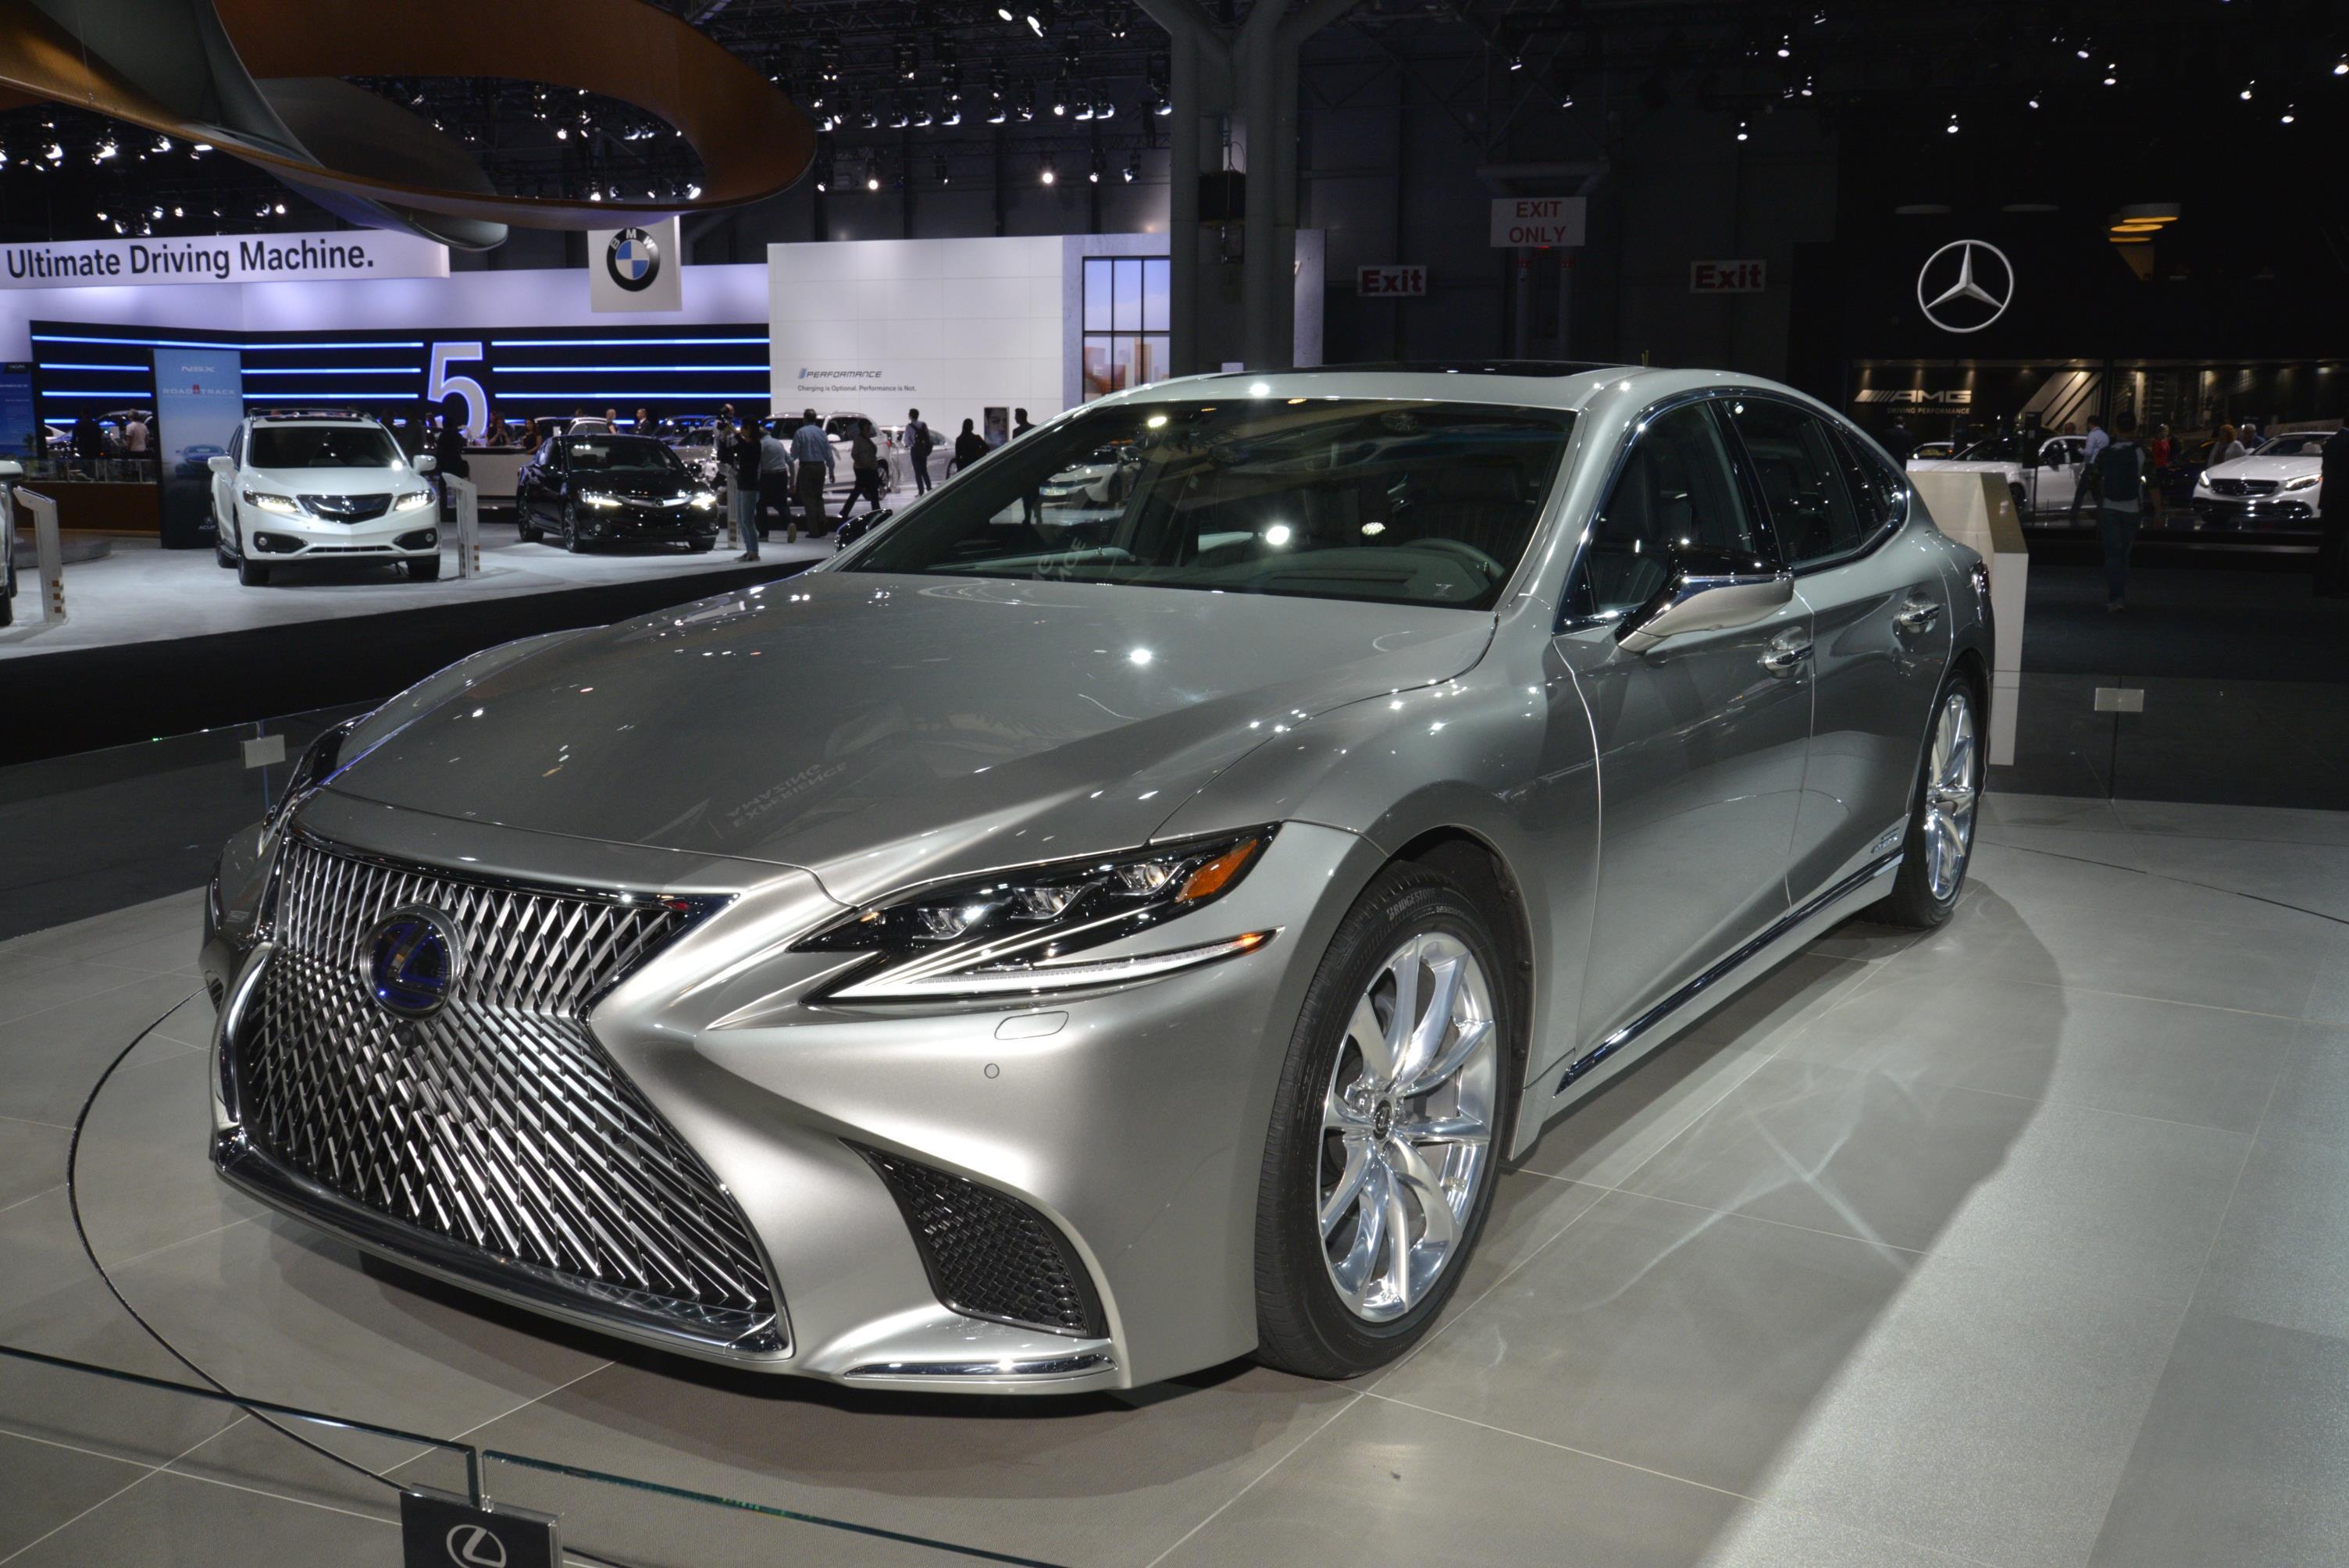 New York Auto Show 2017 (211)